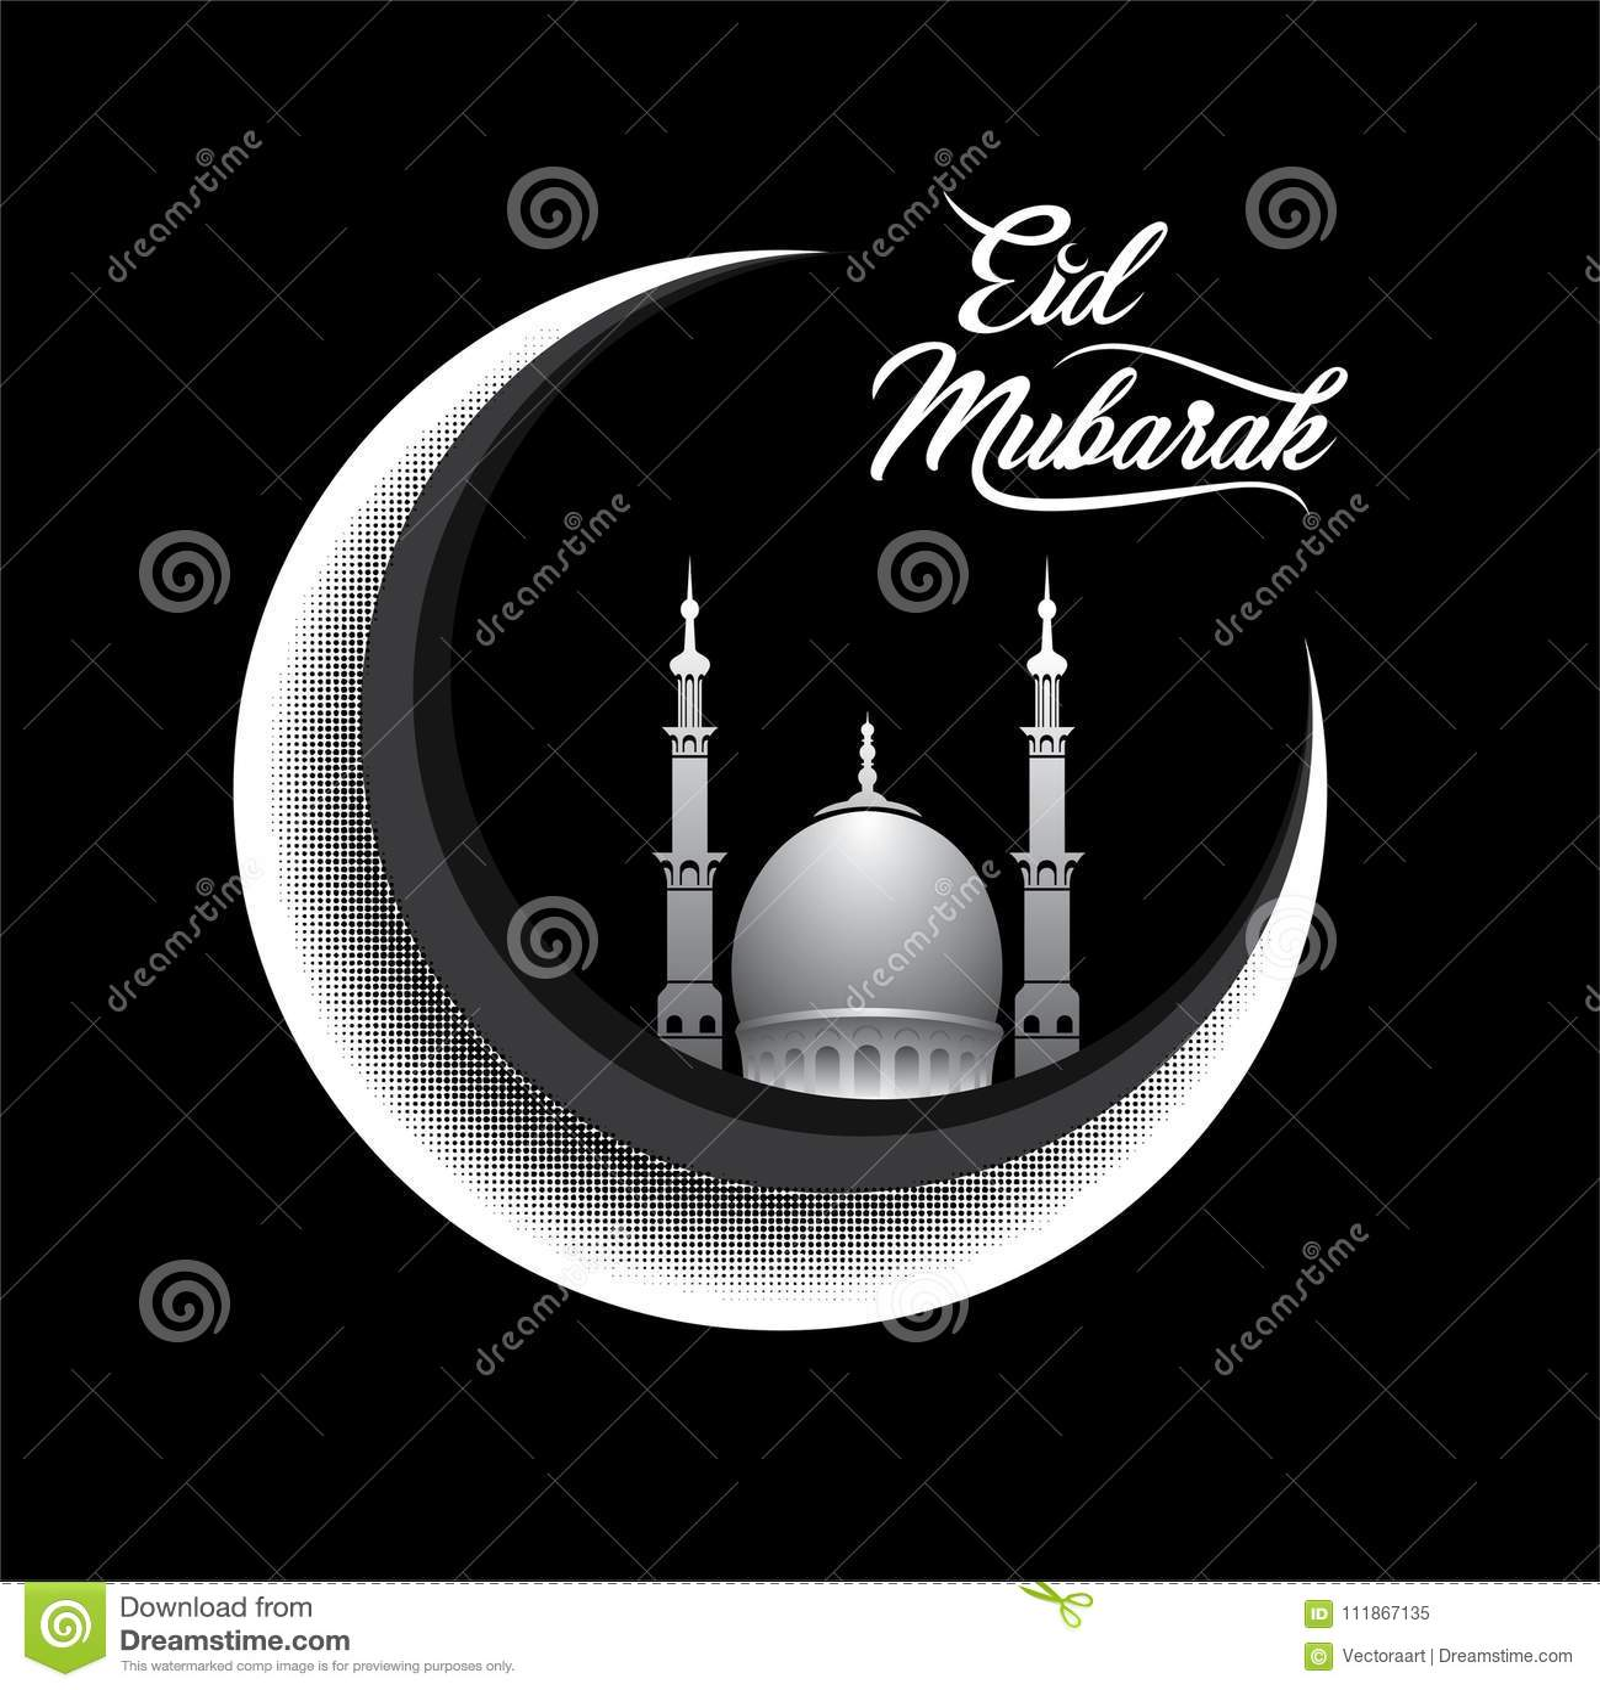 Happy eid mubarak greeting design stock vector illustration of happy eid mubarak greeting design m4hsunfo